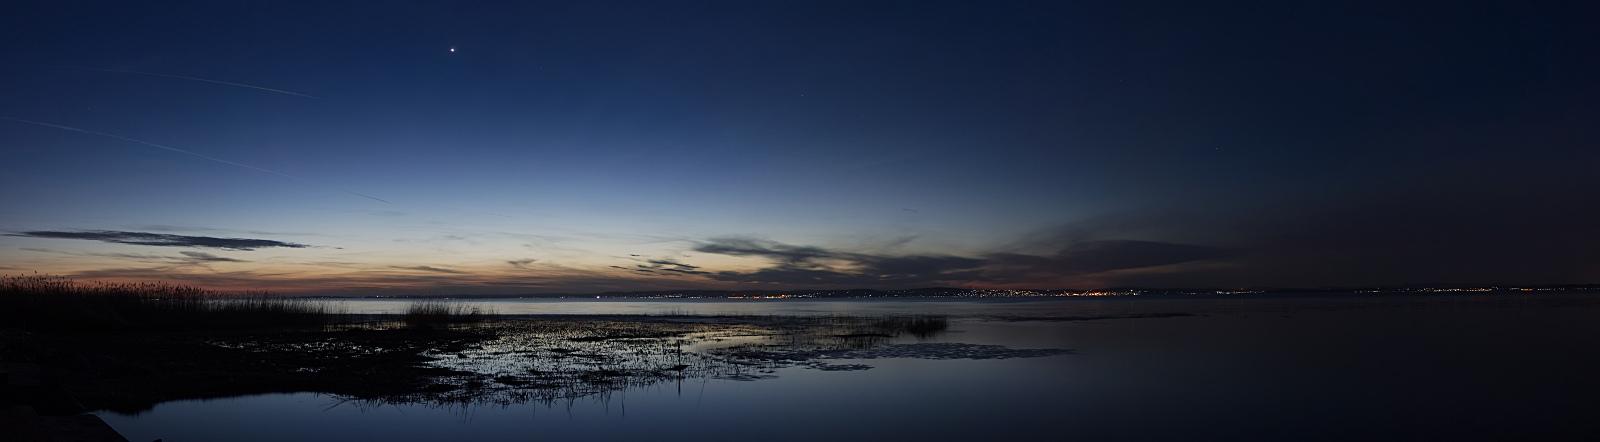 _mg_1462_panorama.jpg